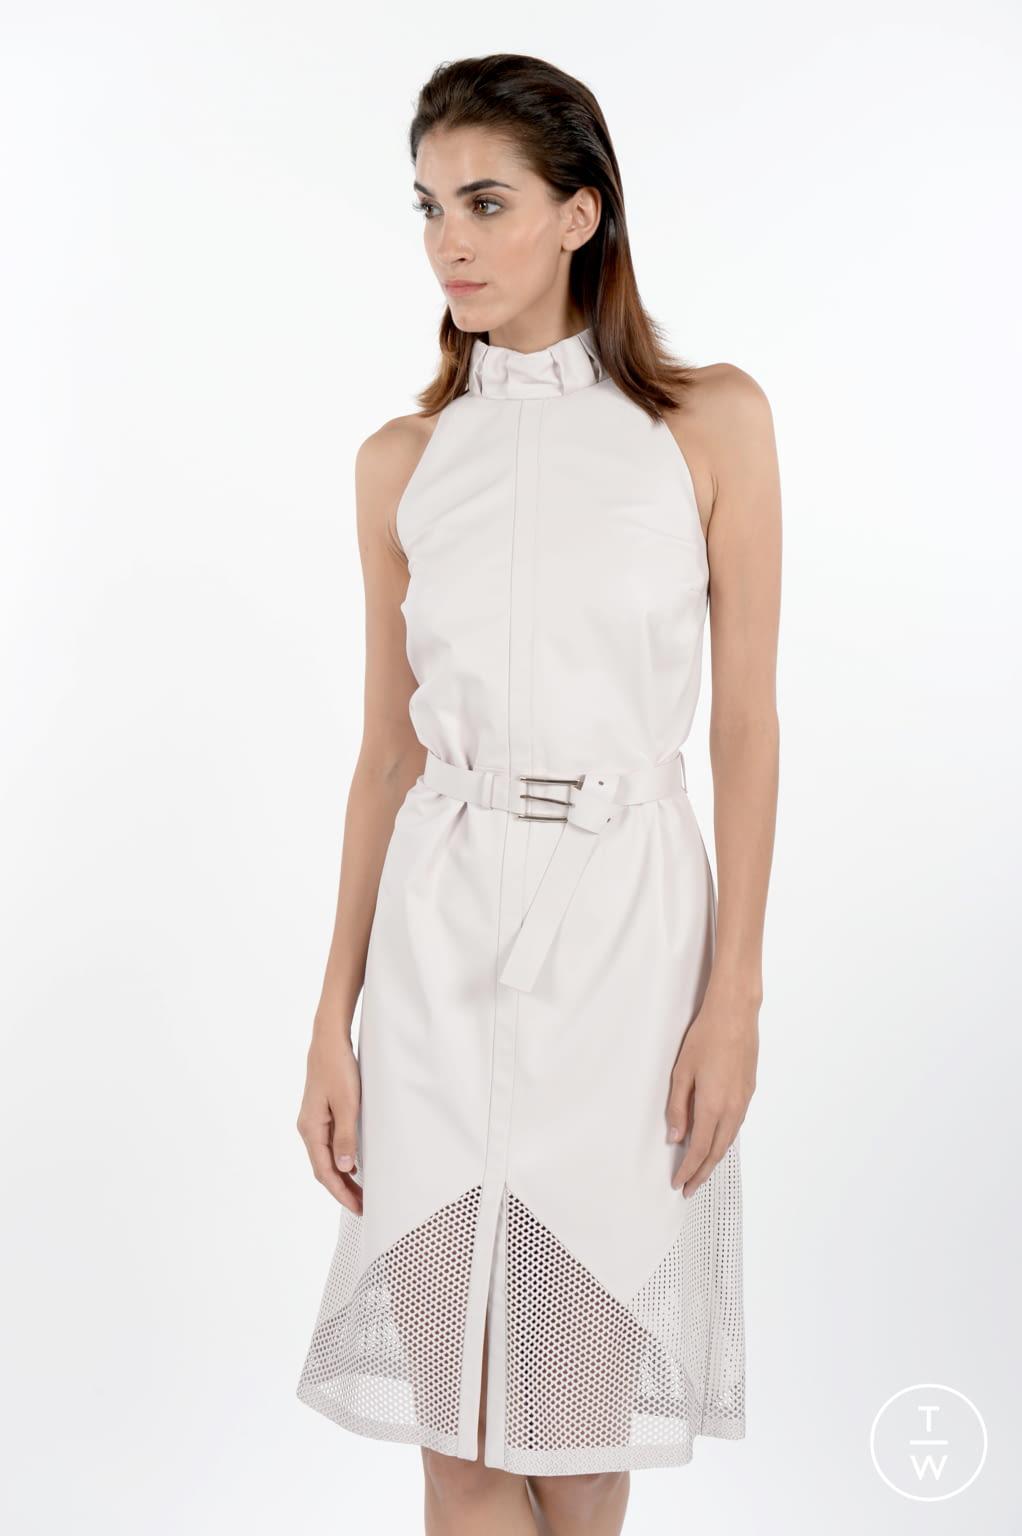 Fashion Week Paris Spring/Summer 2017 look 39 de la collection Maison Ullens womenswear